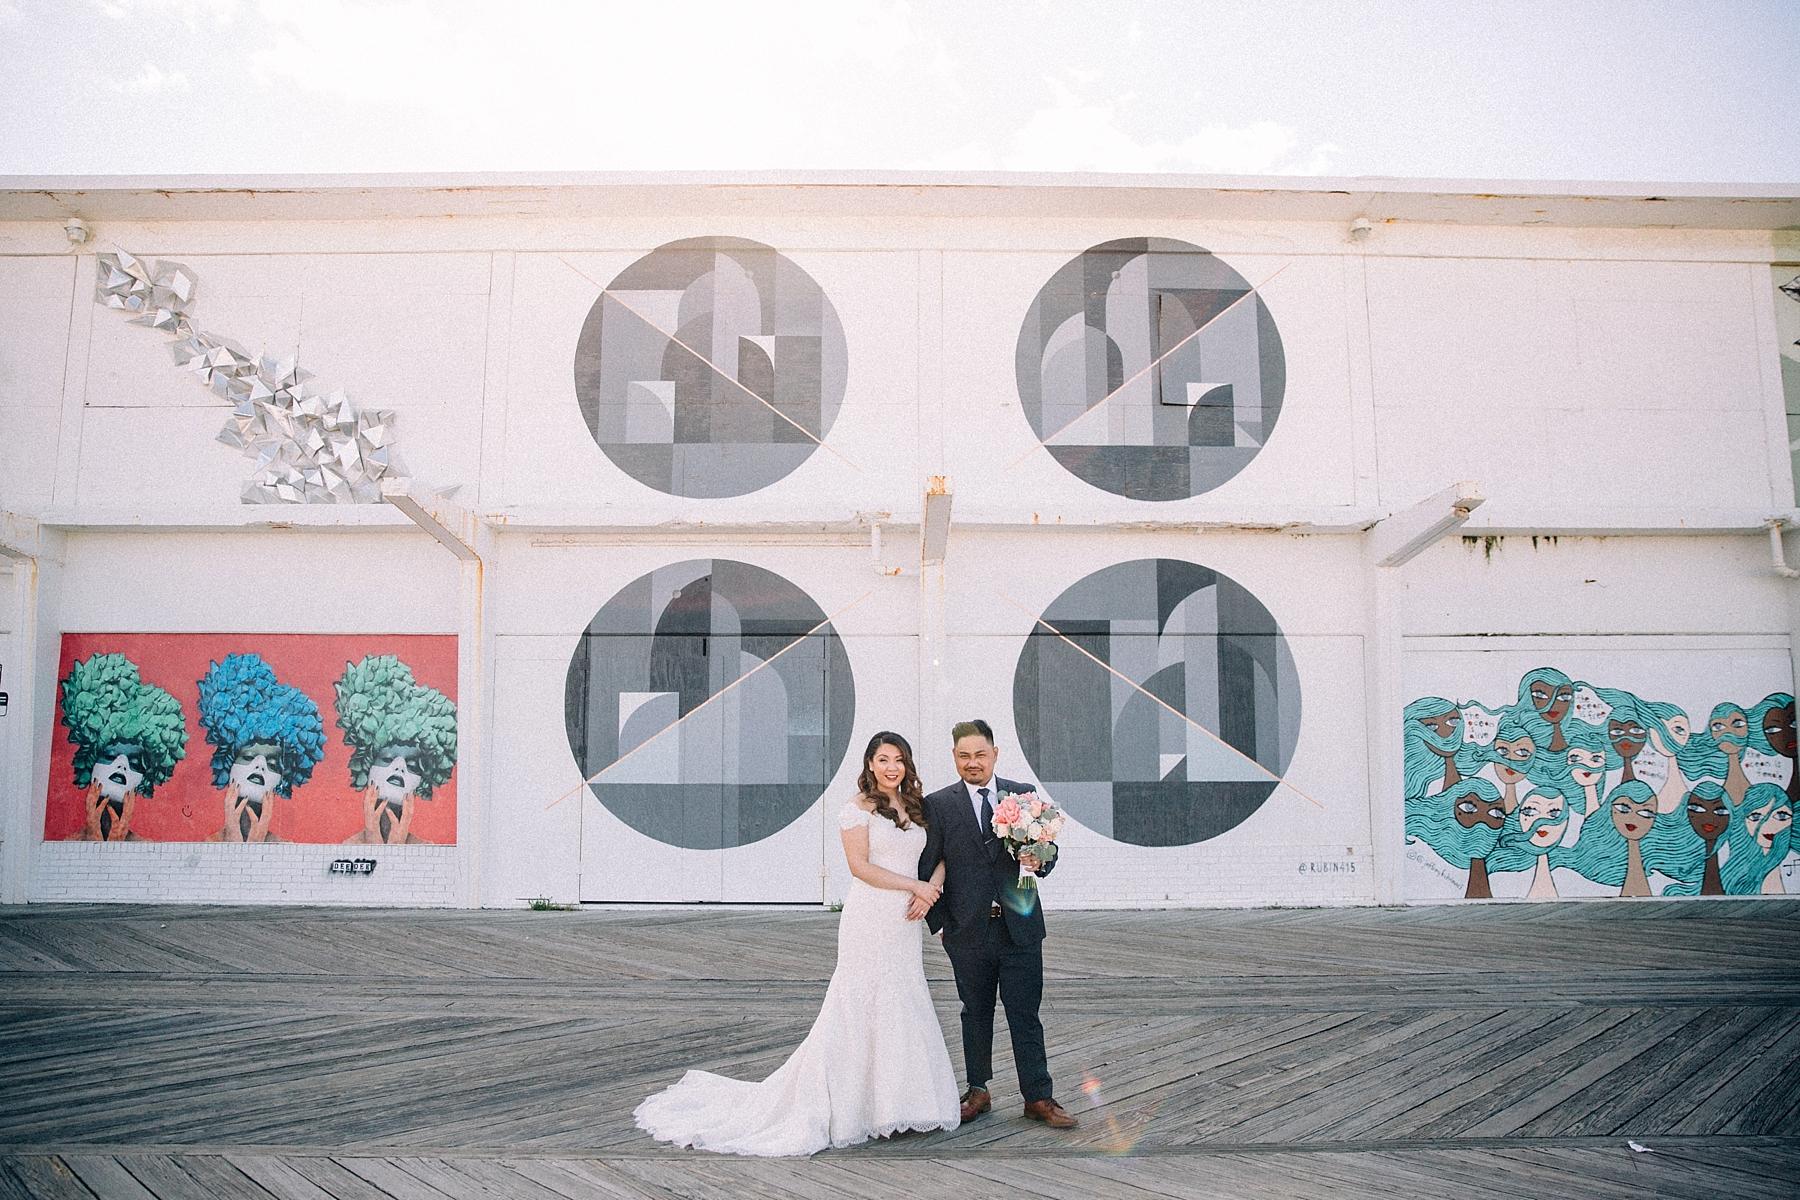 new_jersey_wedding_the_Berkeley_beach_asbury_photographer_0035.jpg